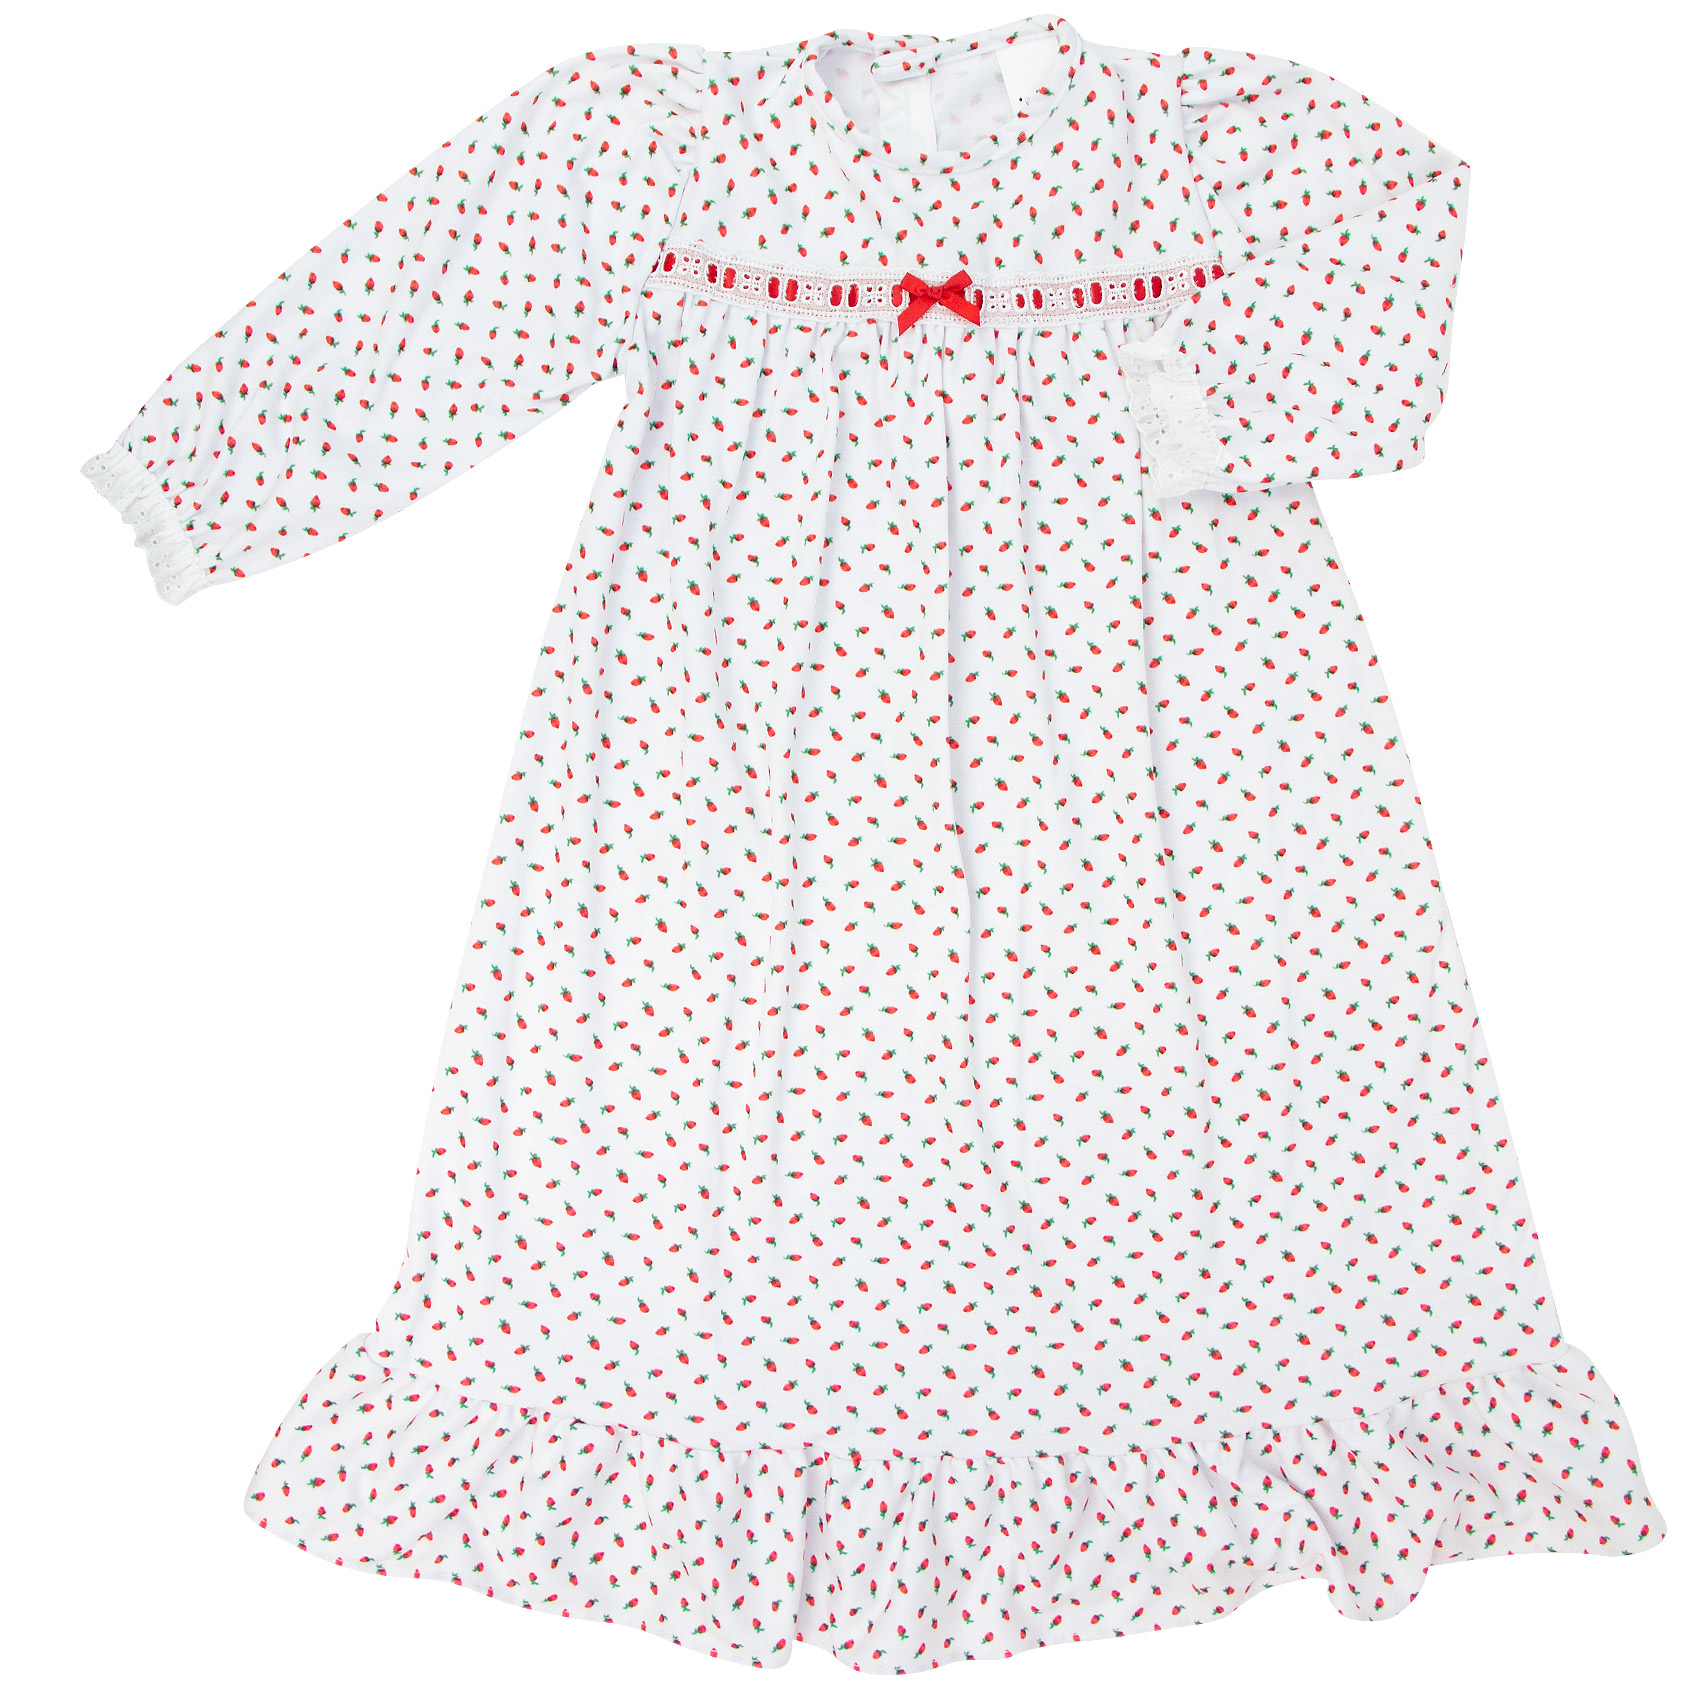 Laura Dare Rosebud Knit Gown